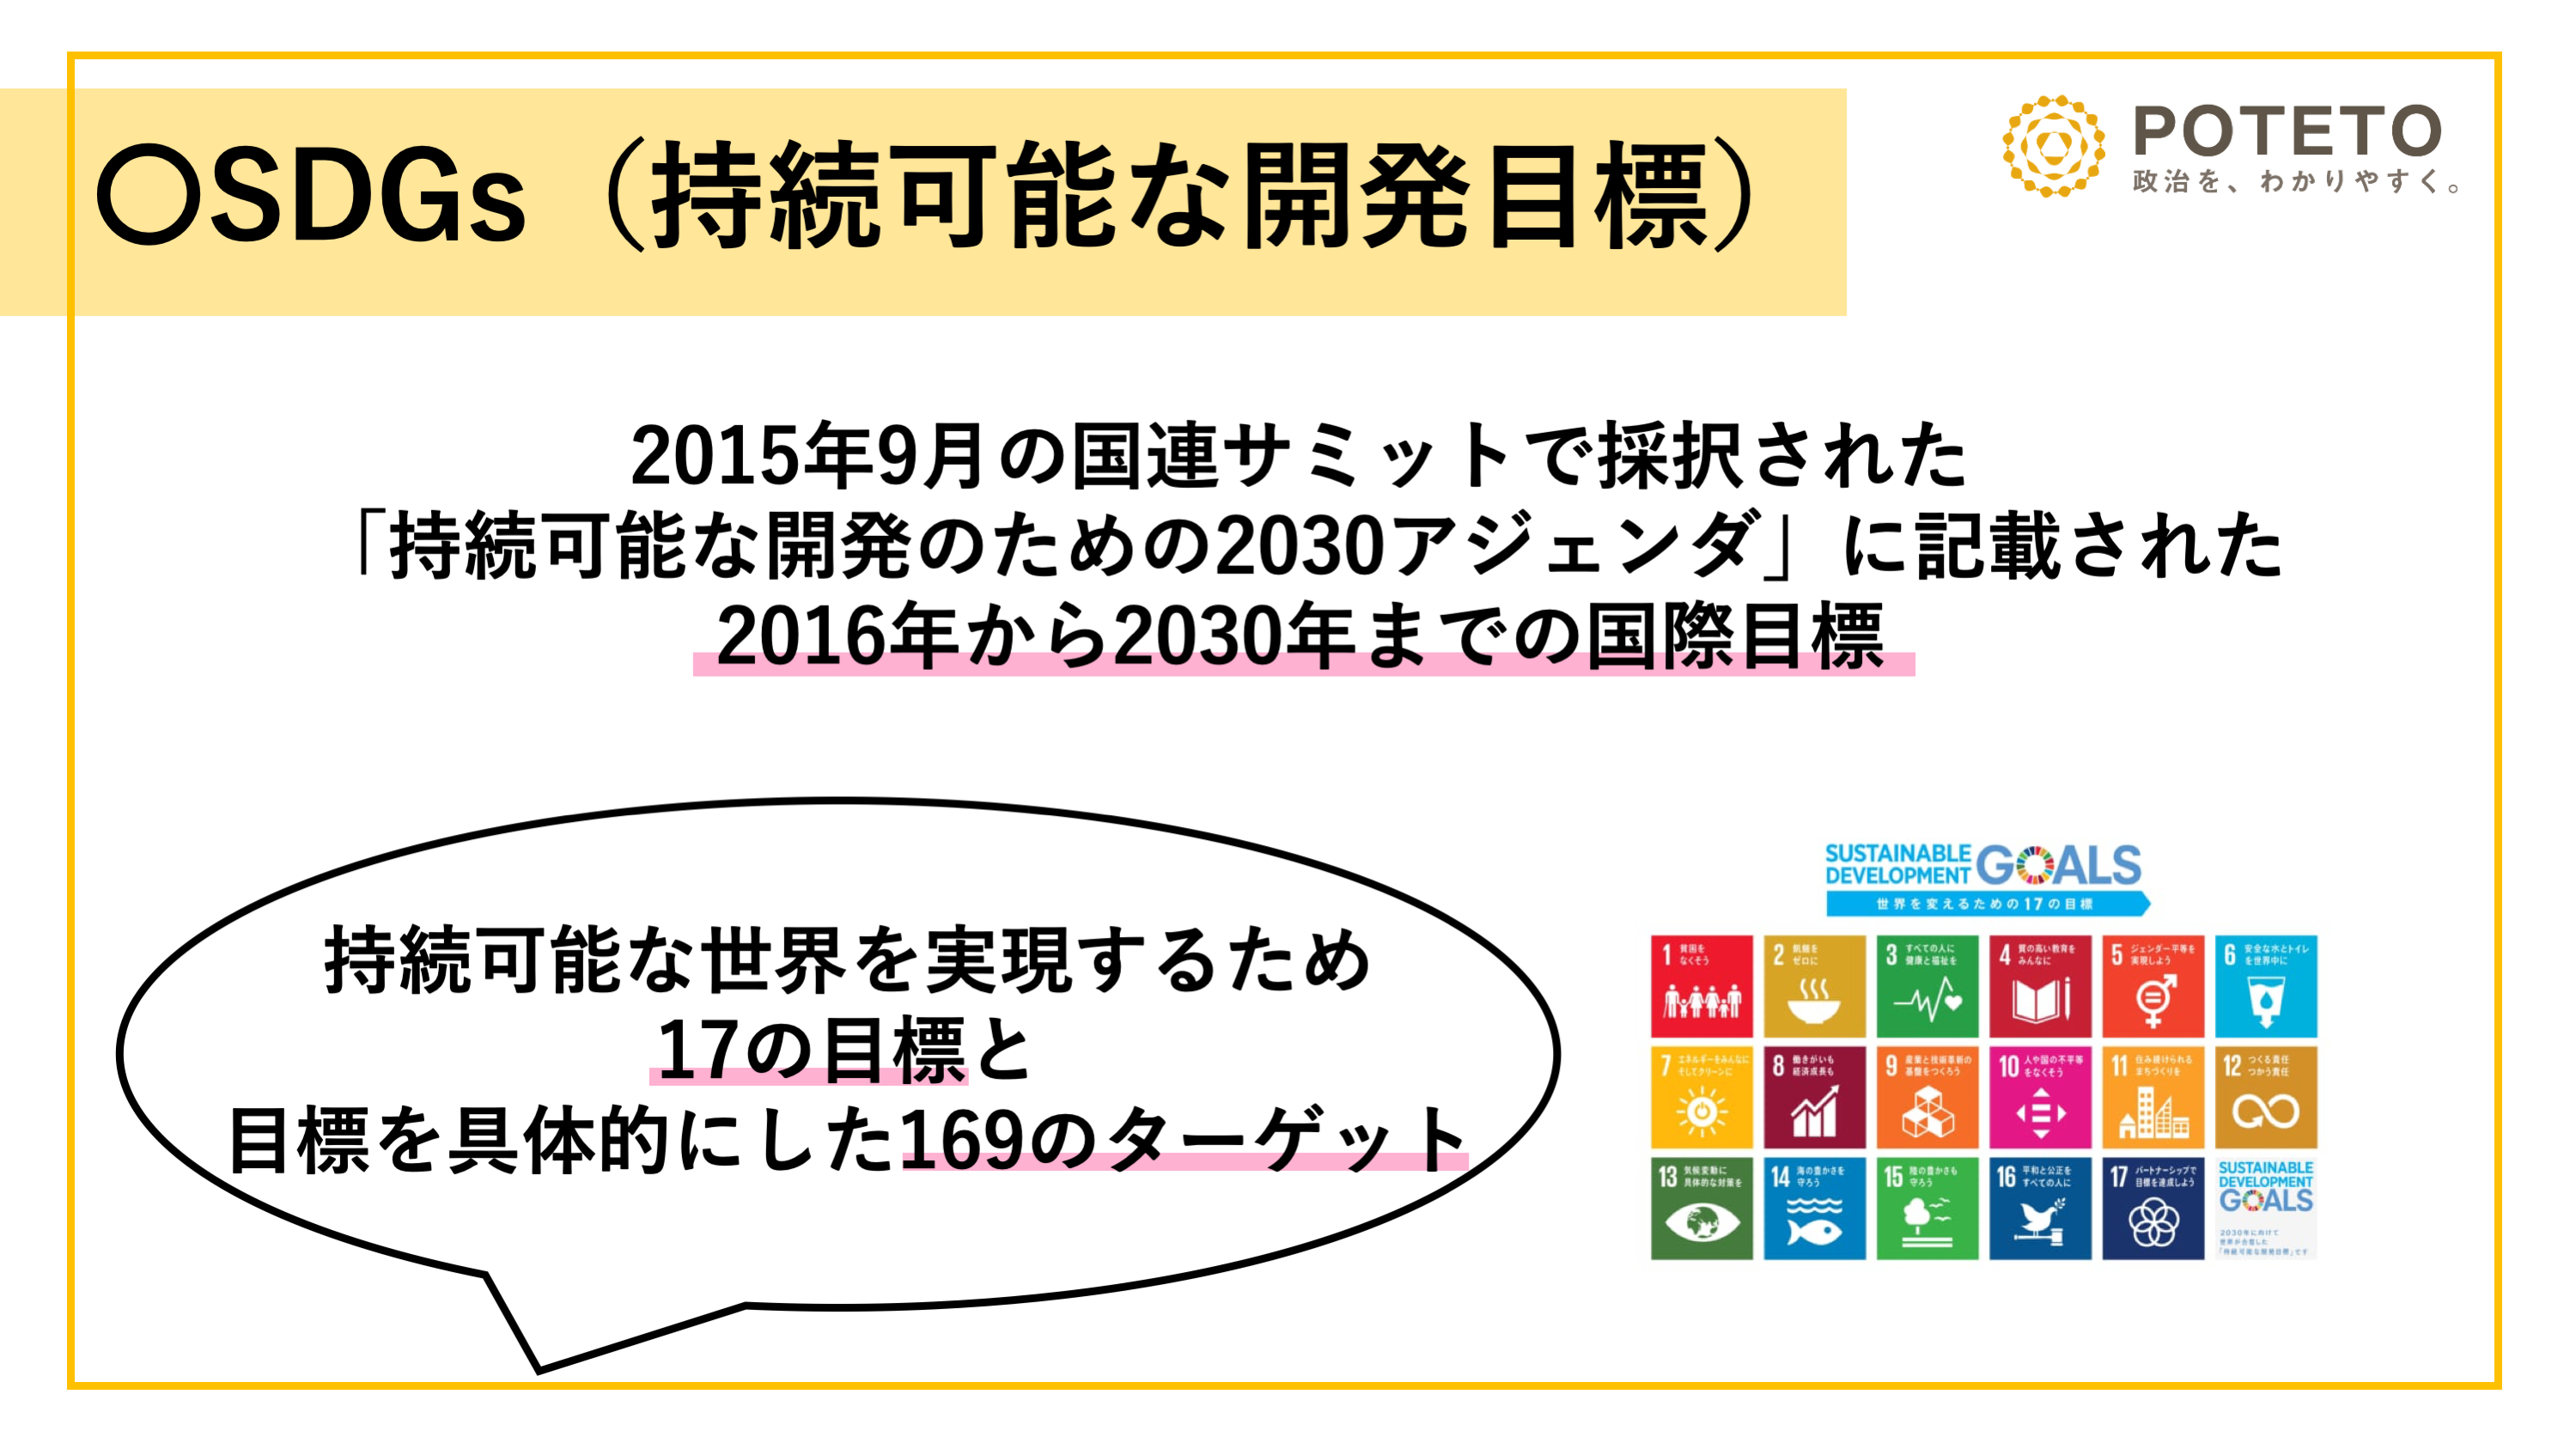 a61c901a422d10759e0af5d1465ba02b 4 - SDGsとは?【POTETOワード】